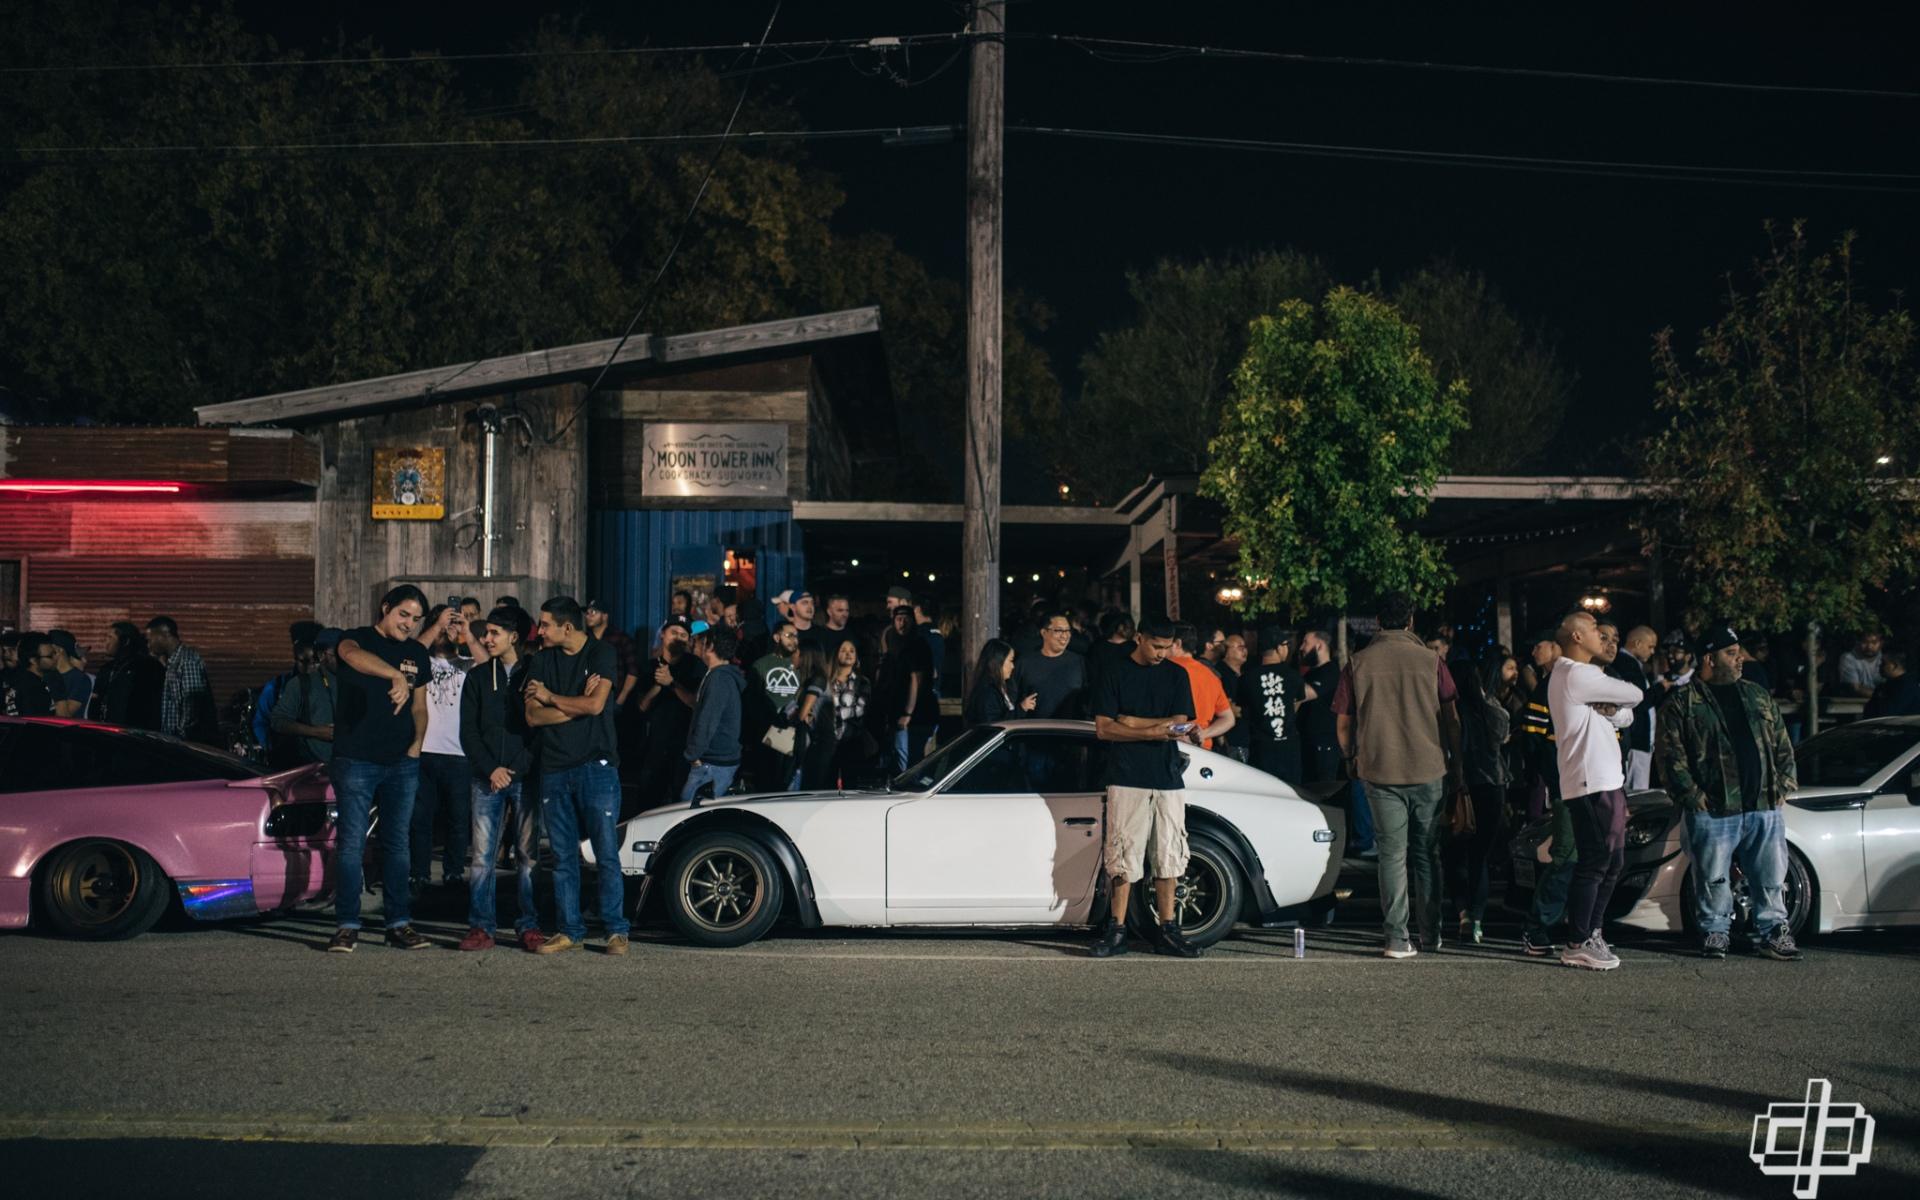 The 2017 Mayday Garage x Wekfest Pre Meet - Best Ricer Car Meet of the Year?